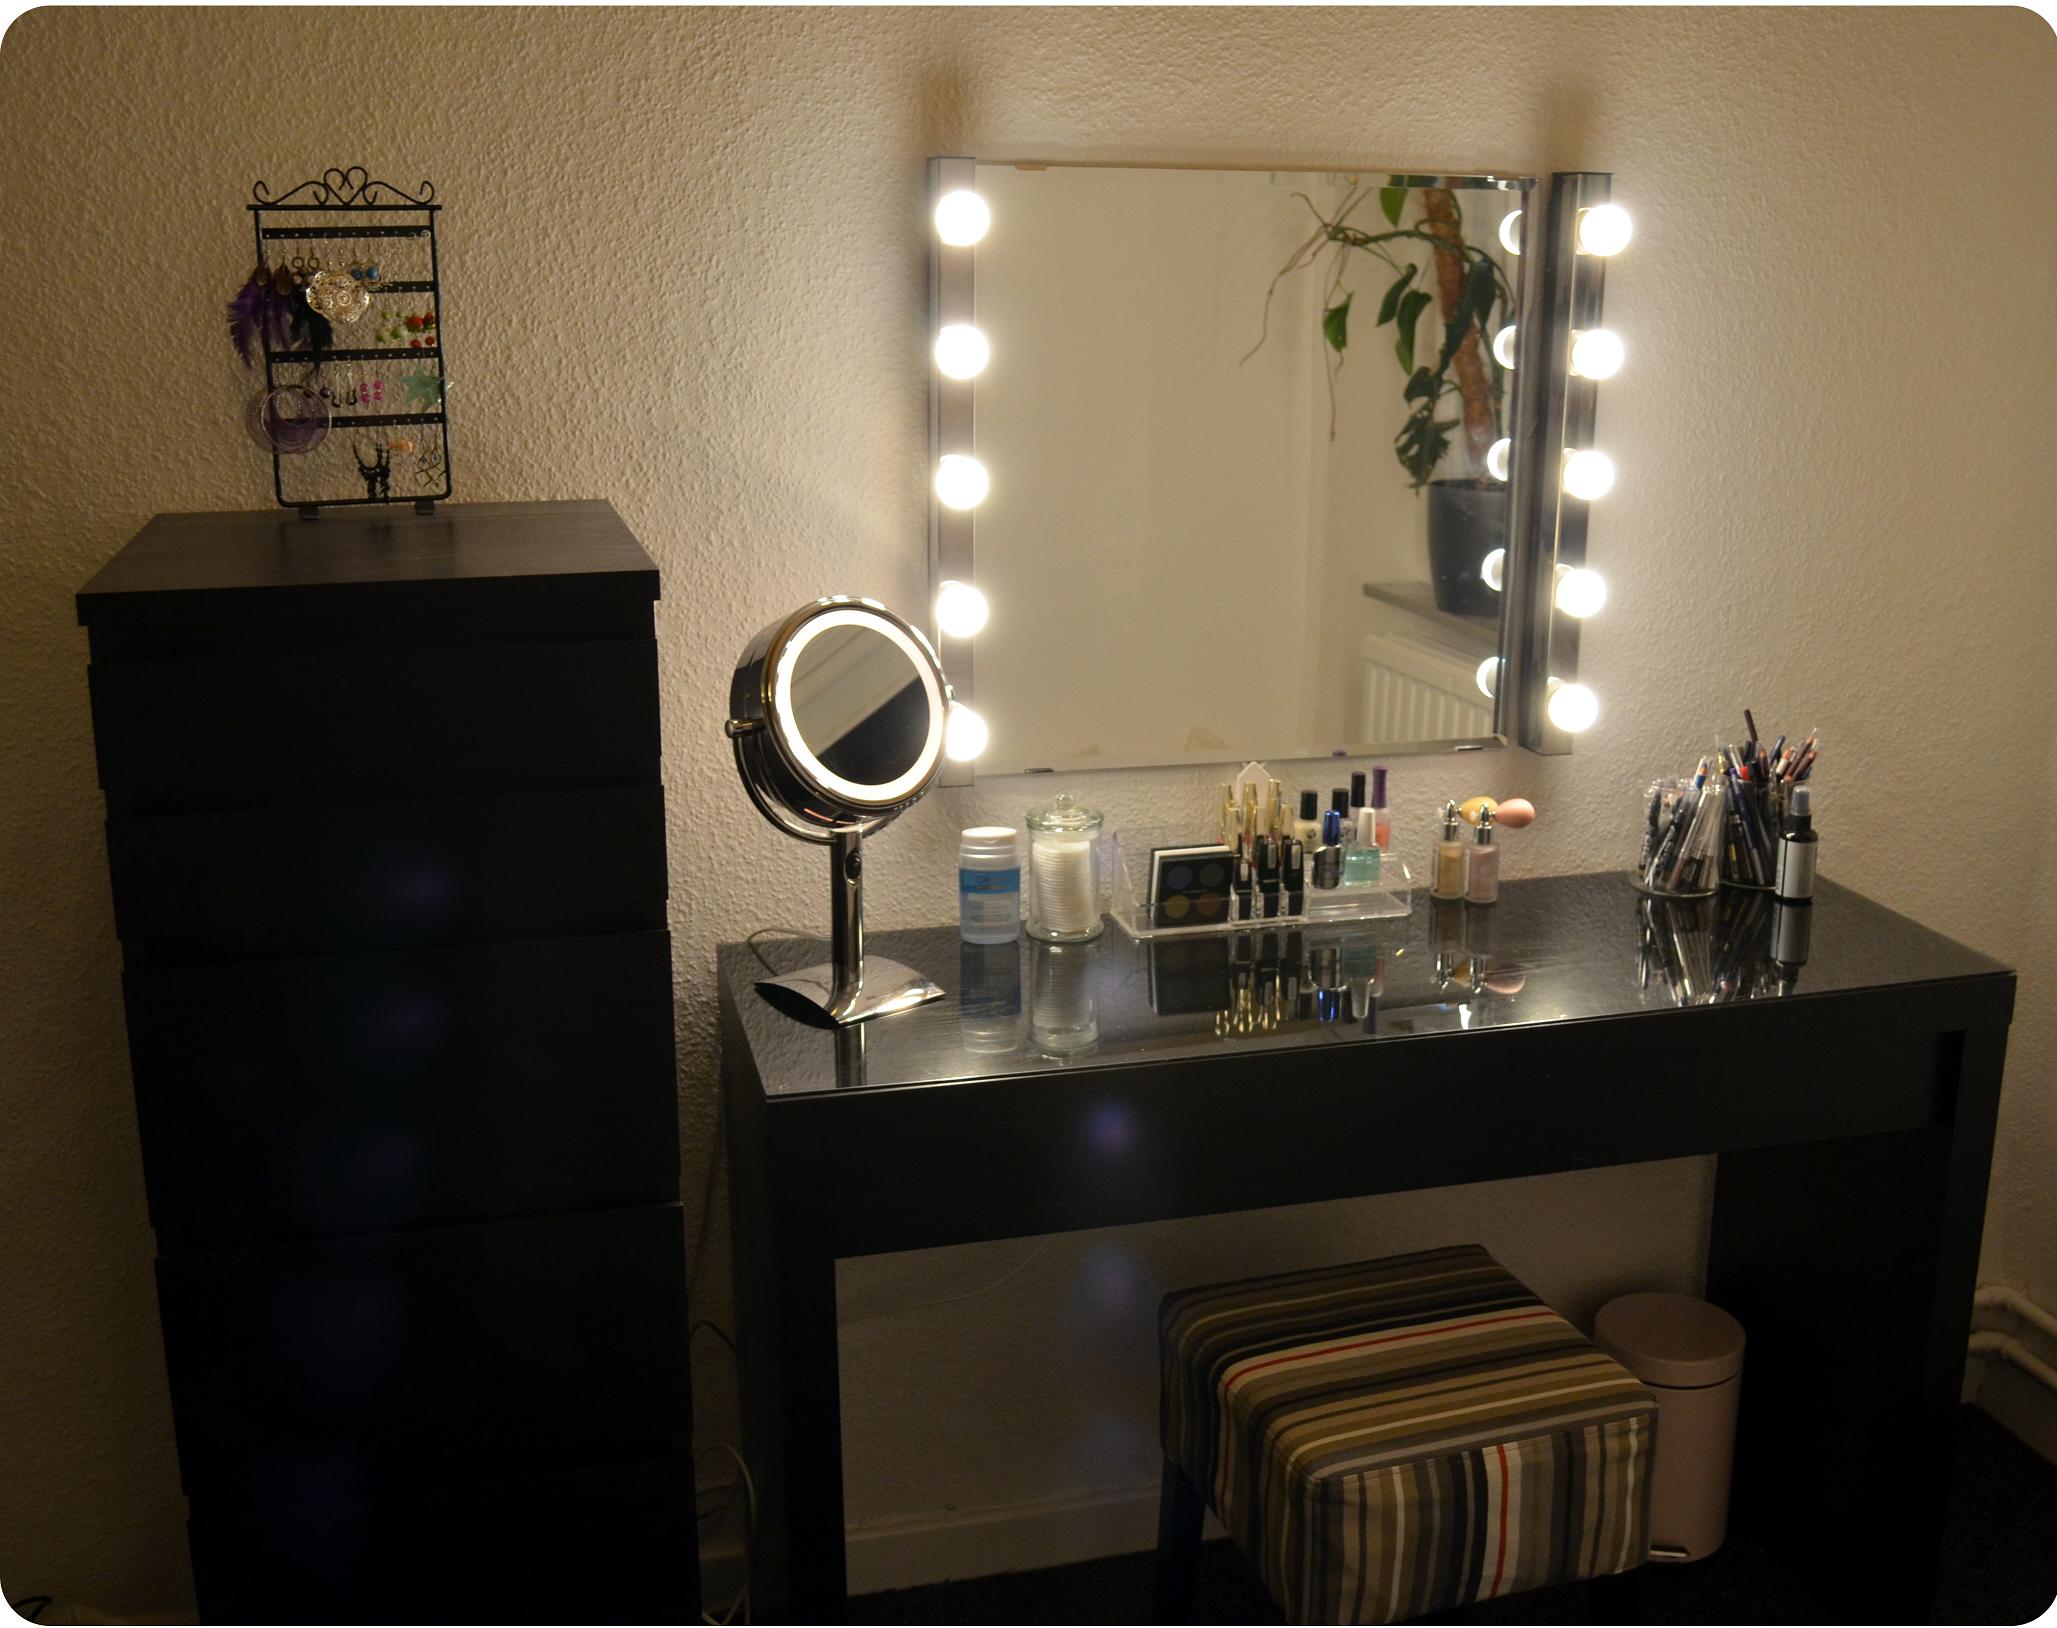 Makeup Vanity Mirror Ikea Step By Step Bedroom Vanity With Lights Diy Vanity Mirror Diy Vanity Mirror With Lights